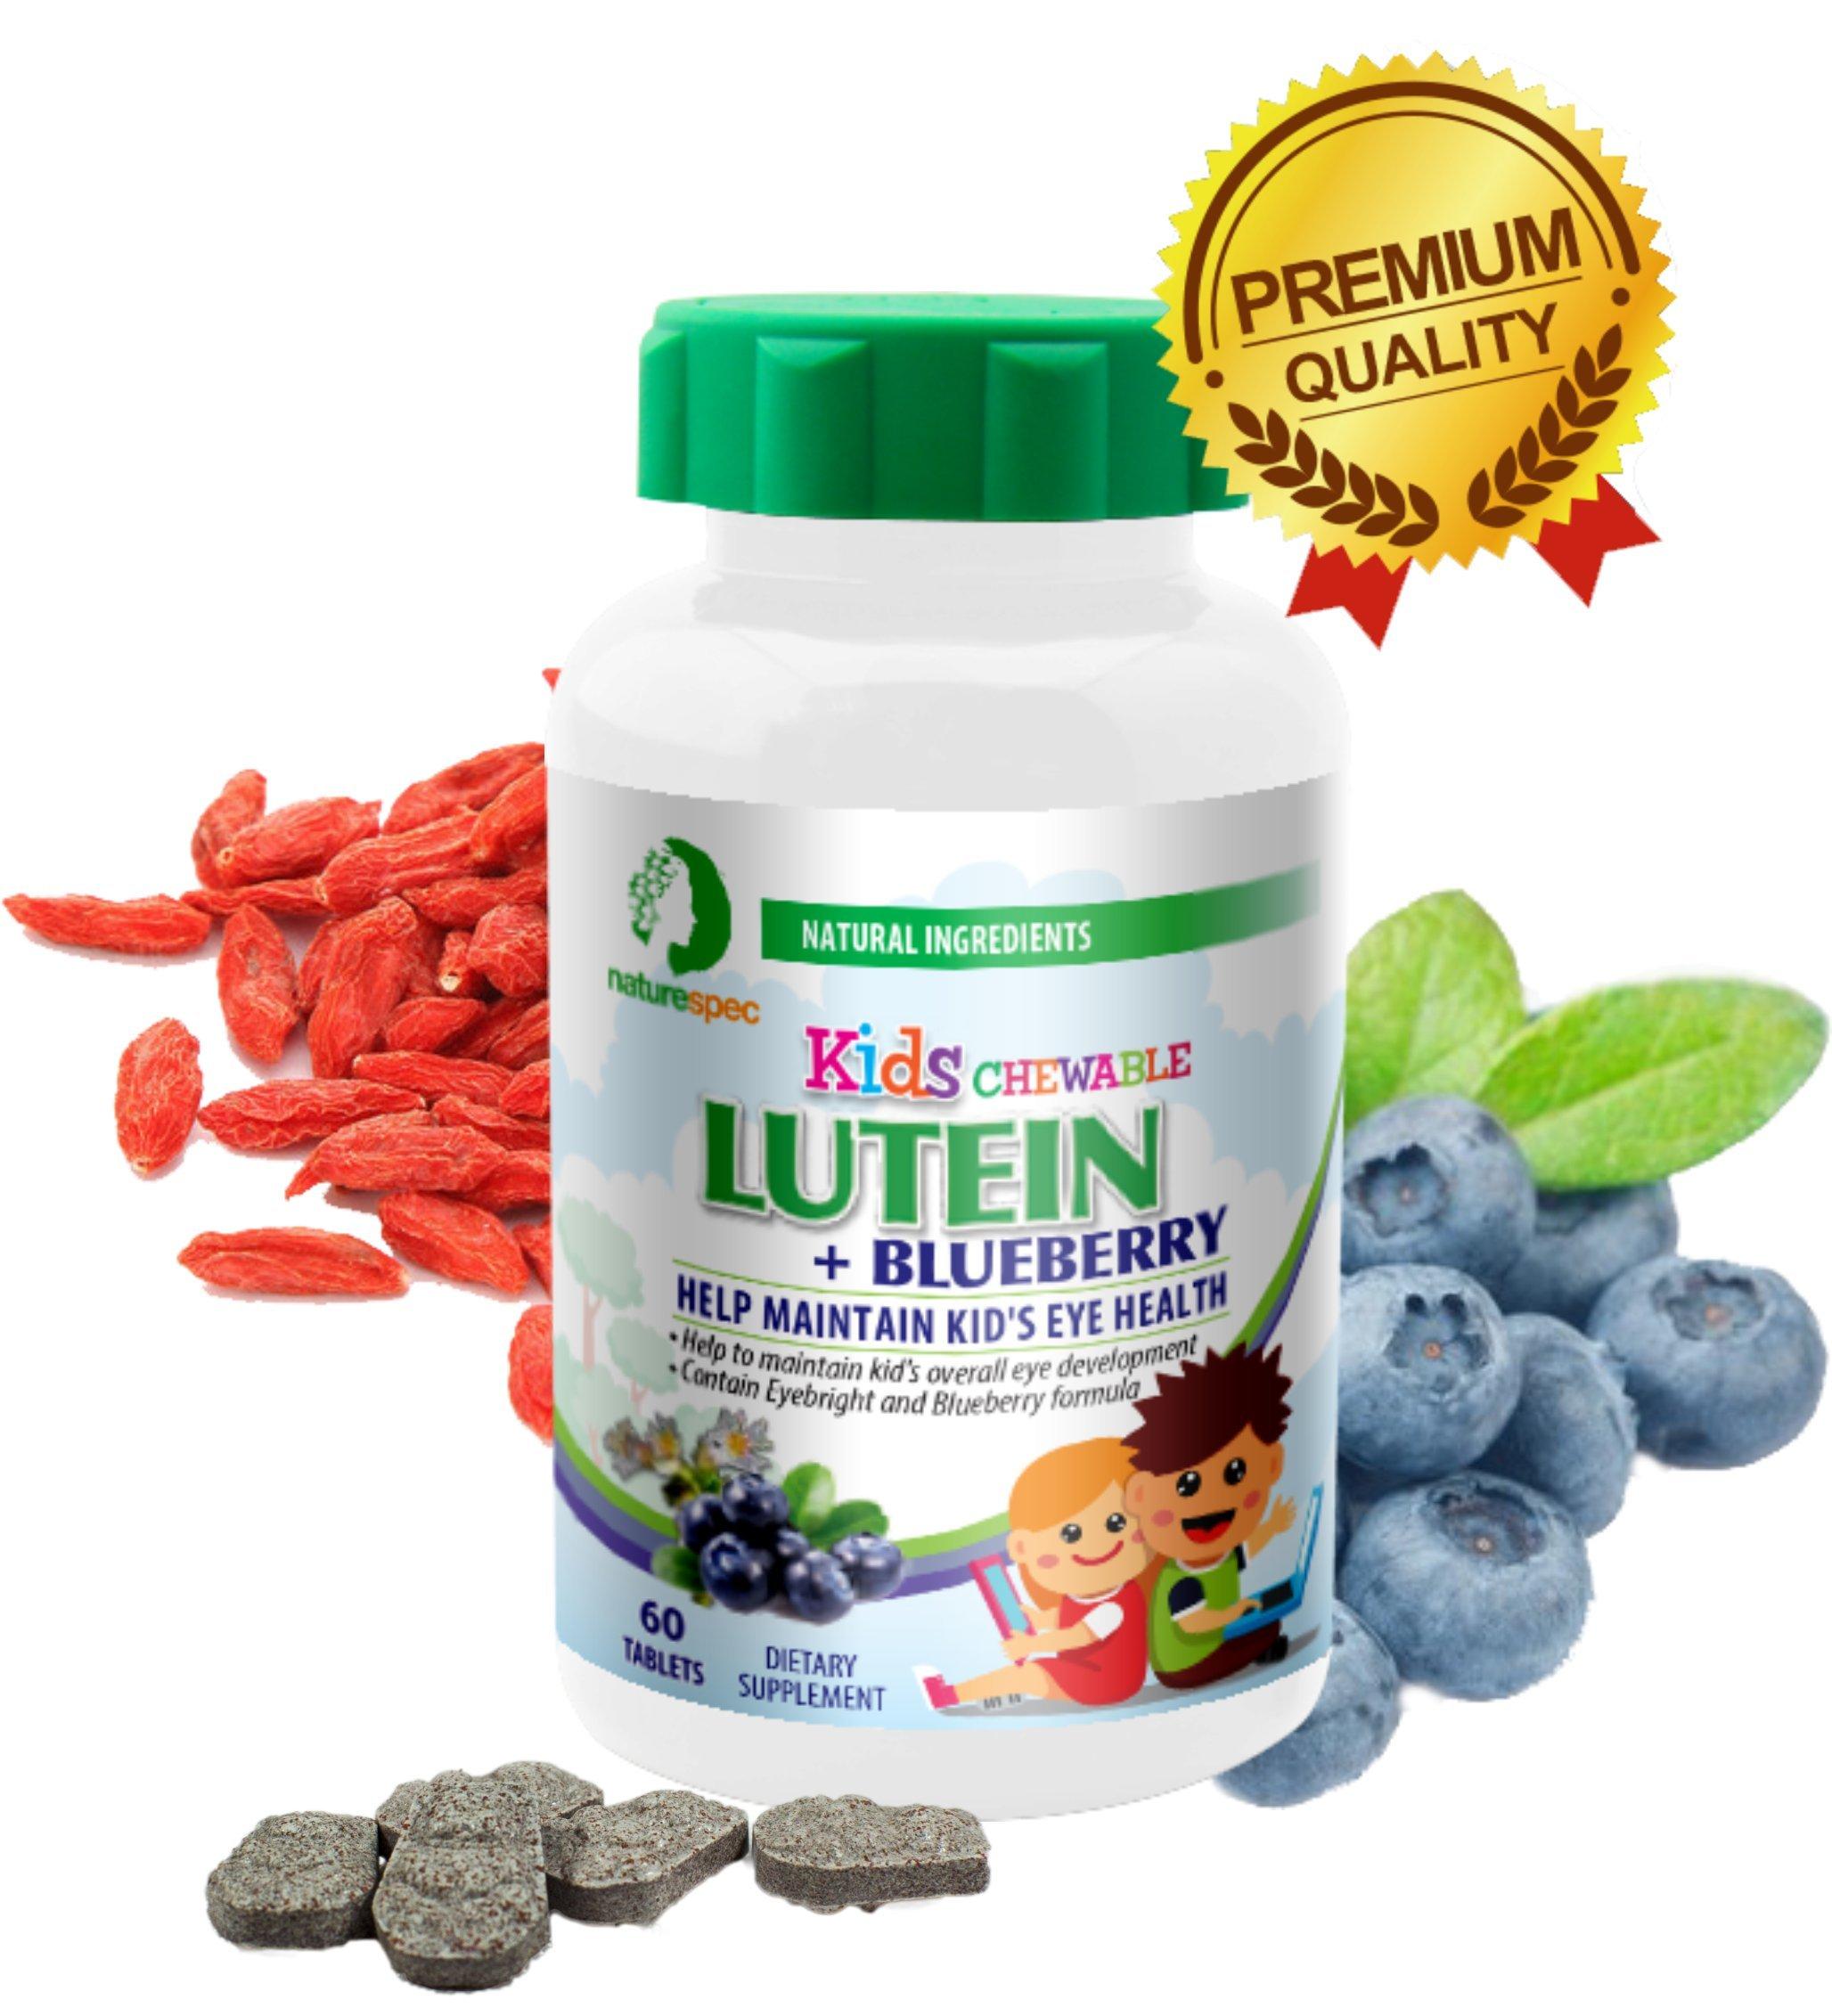 Nature Spec Kids Chewable Lutein Premium Blueberry Flavor Taurine Vitamin Zinc Eyebright Extract Lycium Extract Kid's Eye Health,Vitamin Chewbale Eye Health Kid Lutein by Nature Spec